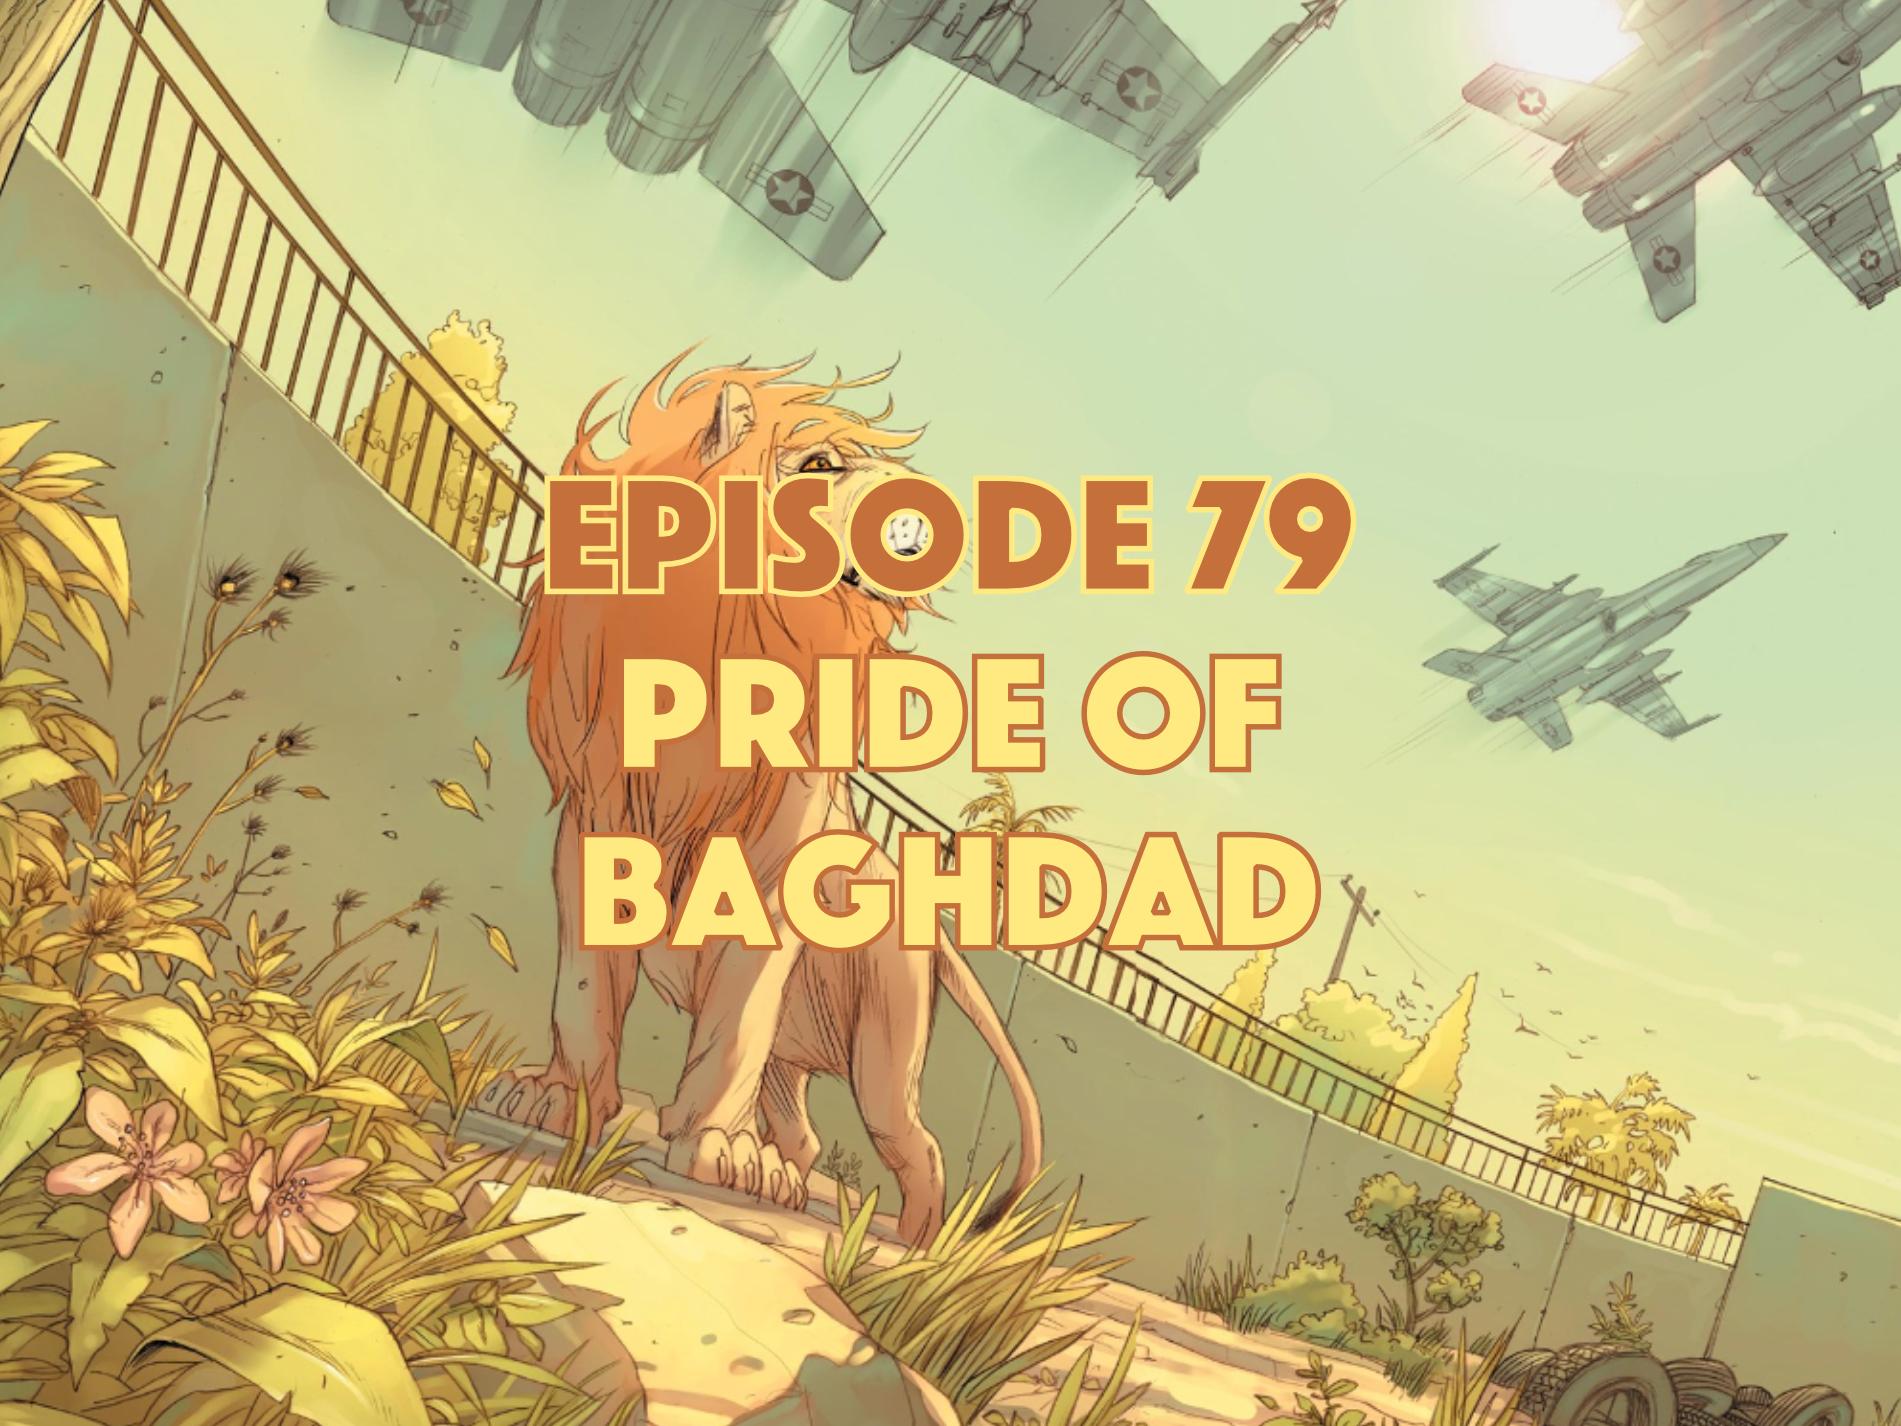 Pride of Baghdad, Graphic Novel Explorers Club, Comic Book Podcast, Graphic Novel Podcast, Graphic Novel Explorers Club, Comic Book Podcast, Graphic Novel Podcast